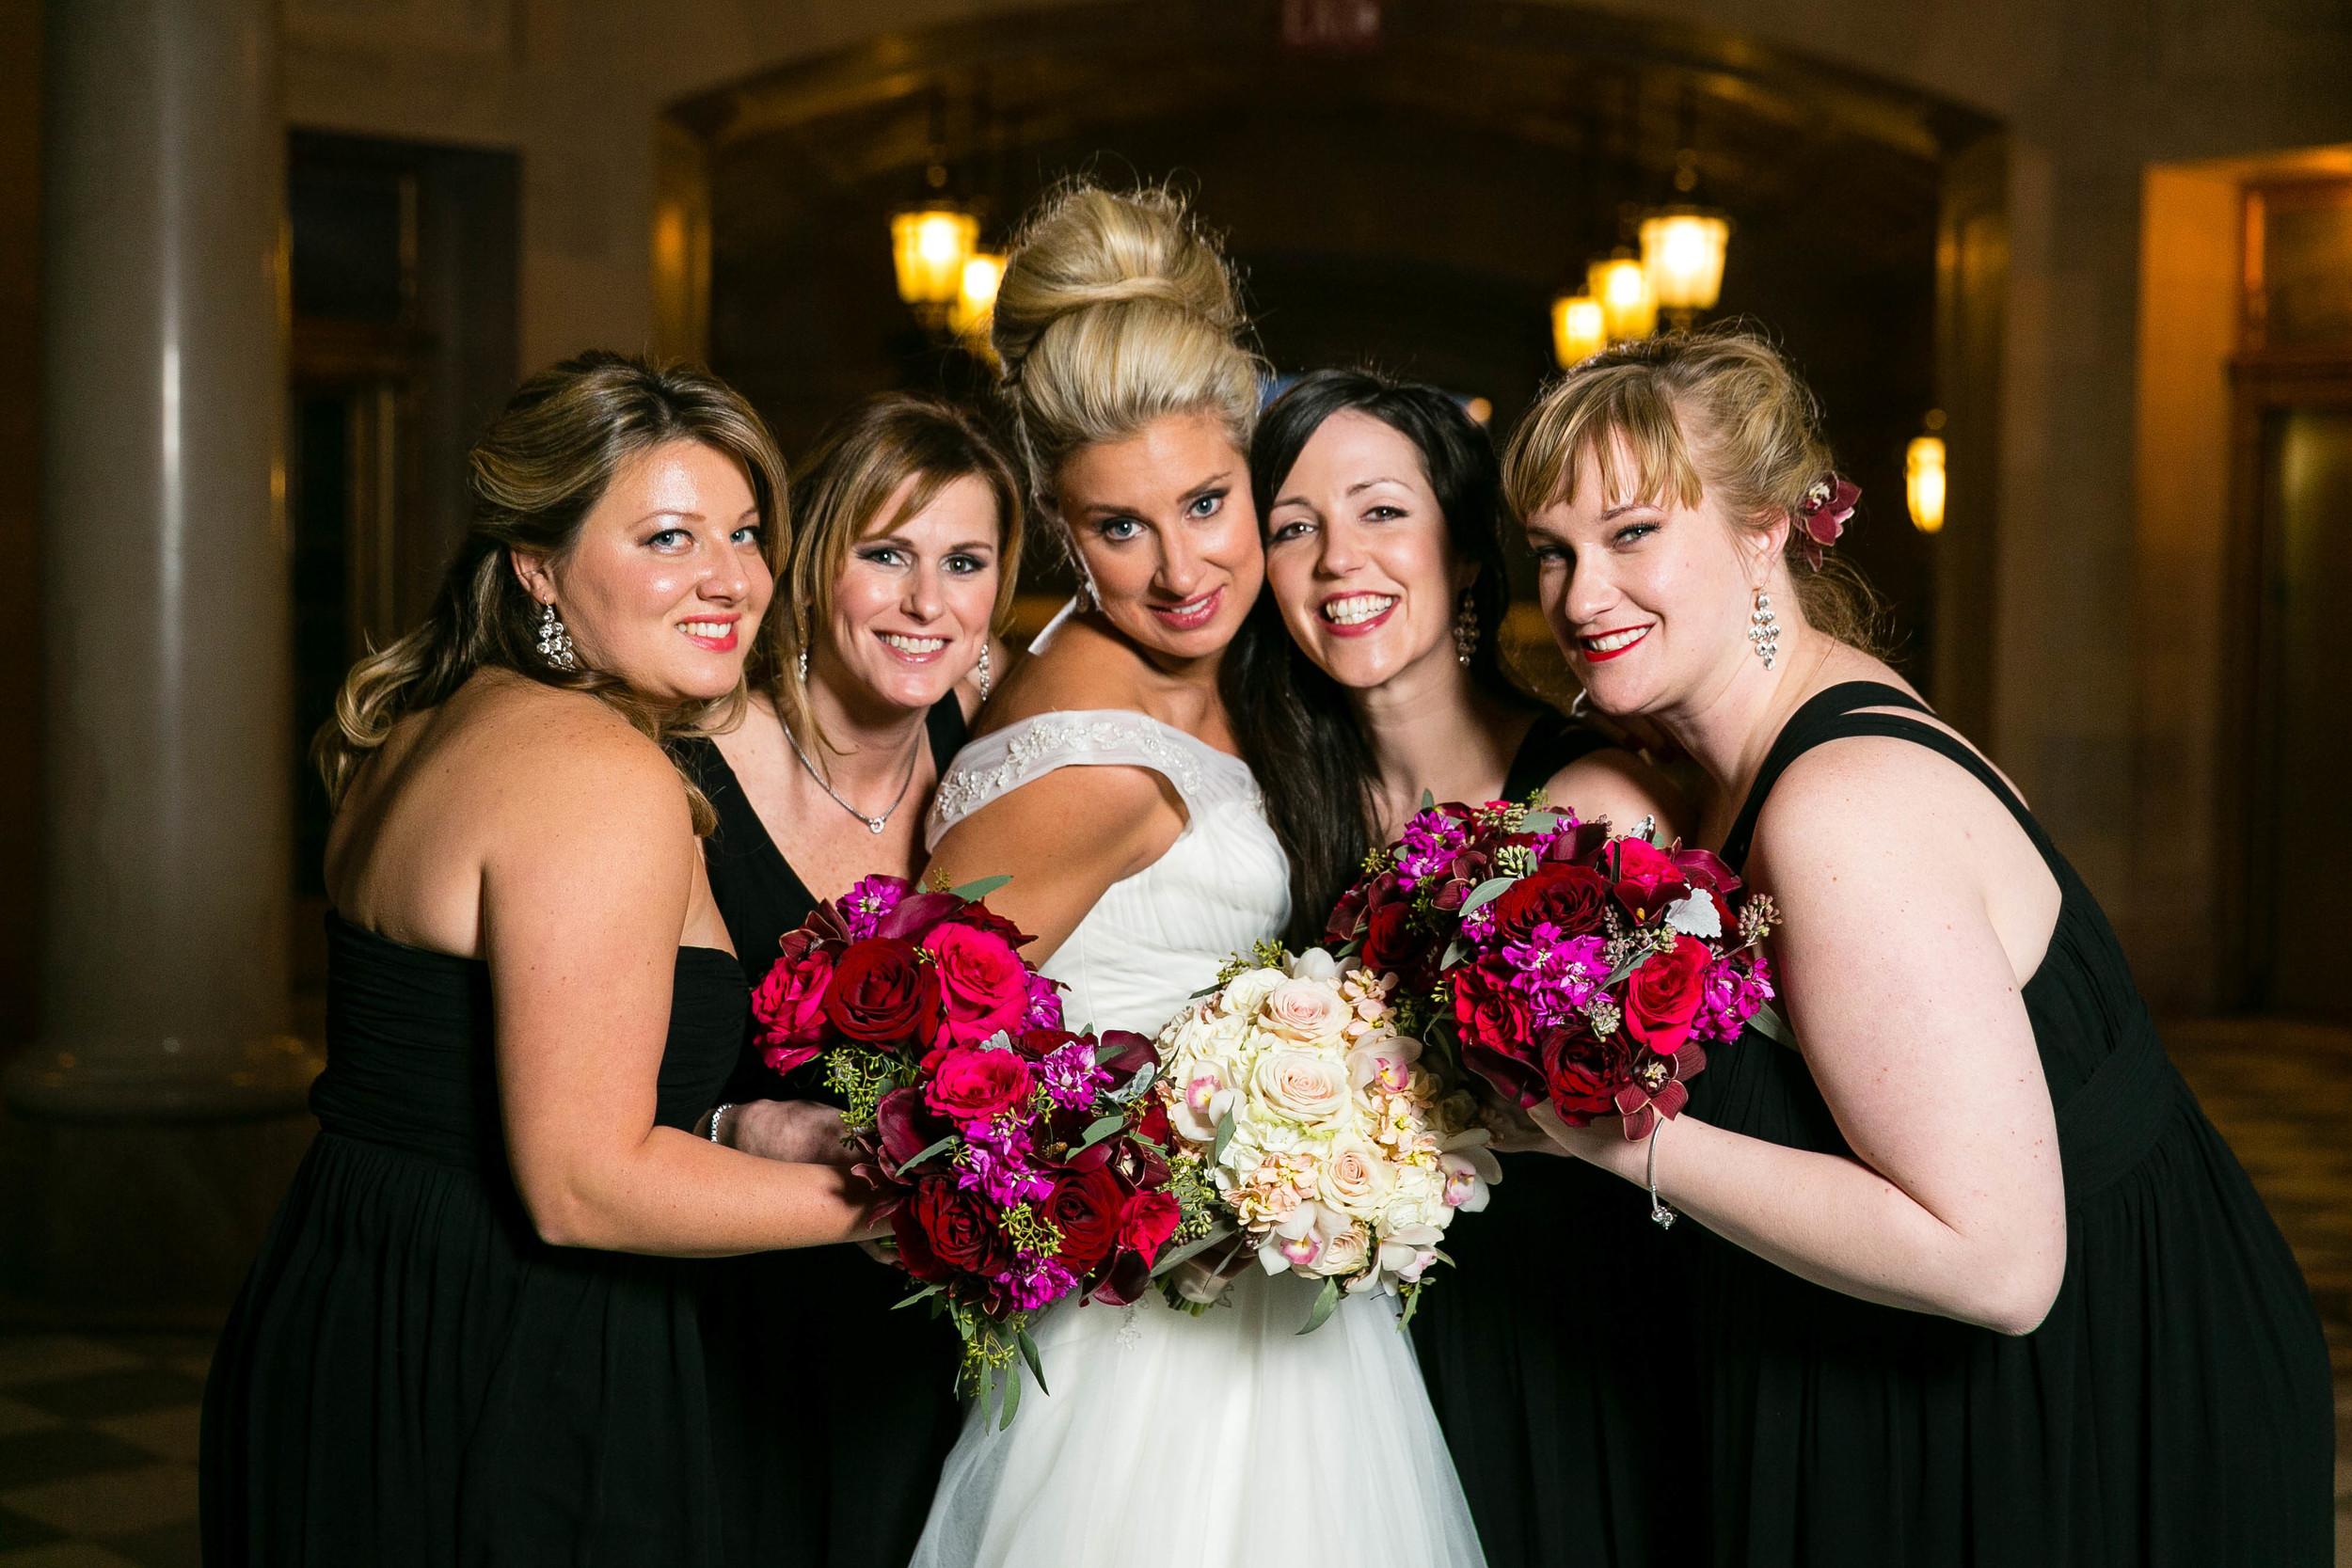 Jewish-Wedding-The-Society-Room-of-Hartford-Connecticut-Documentary-Wedding-Photography-Jacek-Dolata-5.jpg